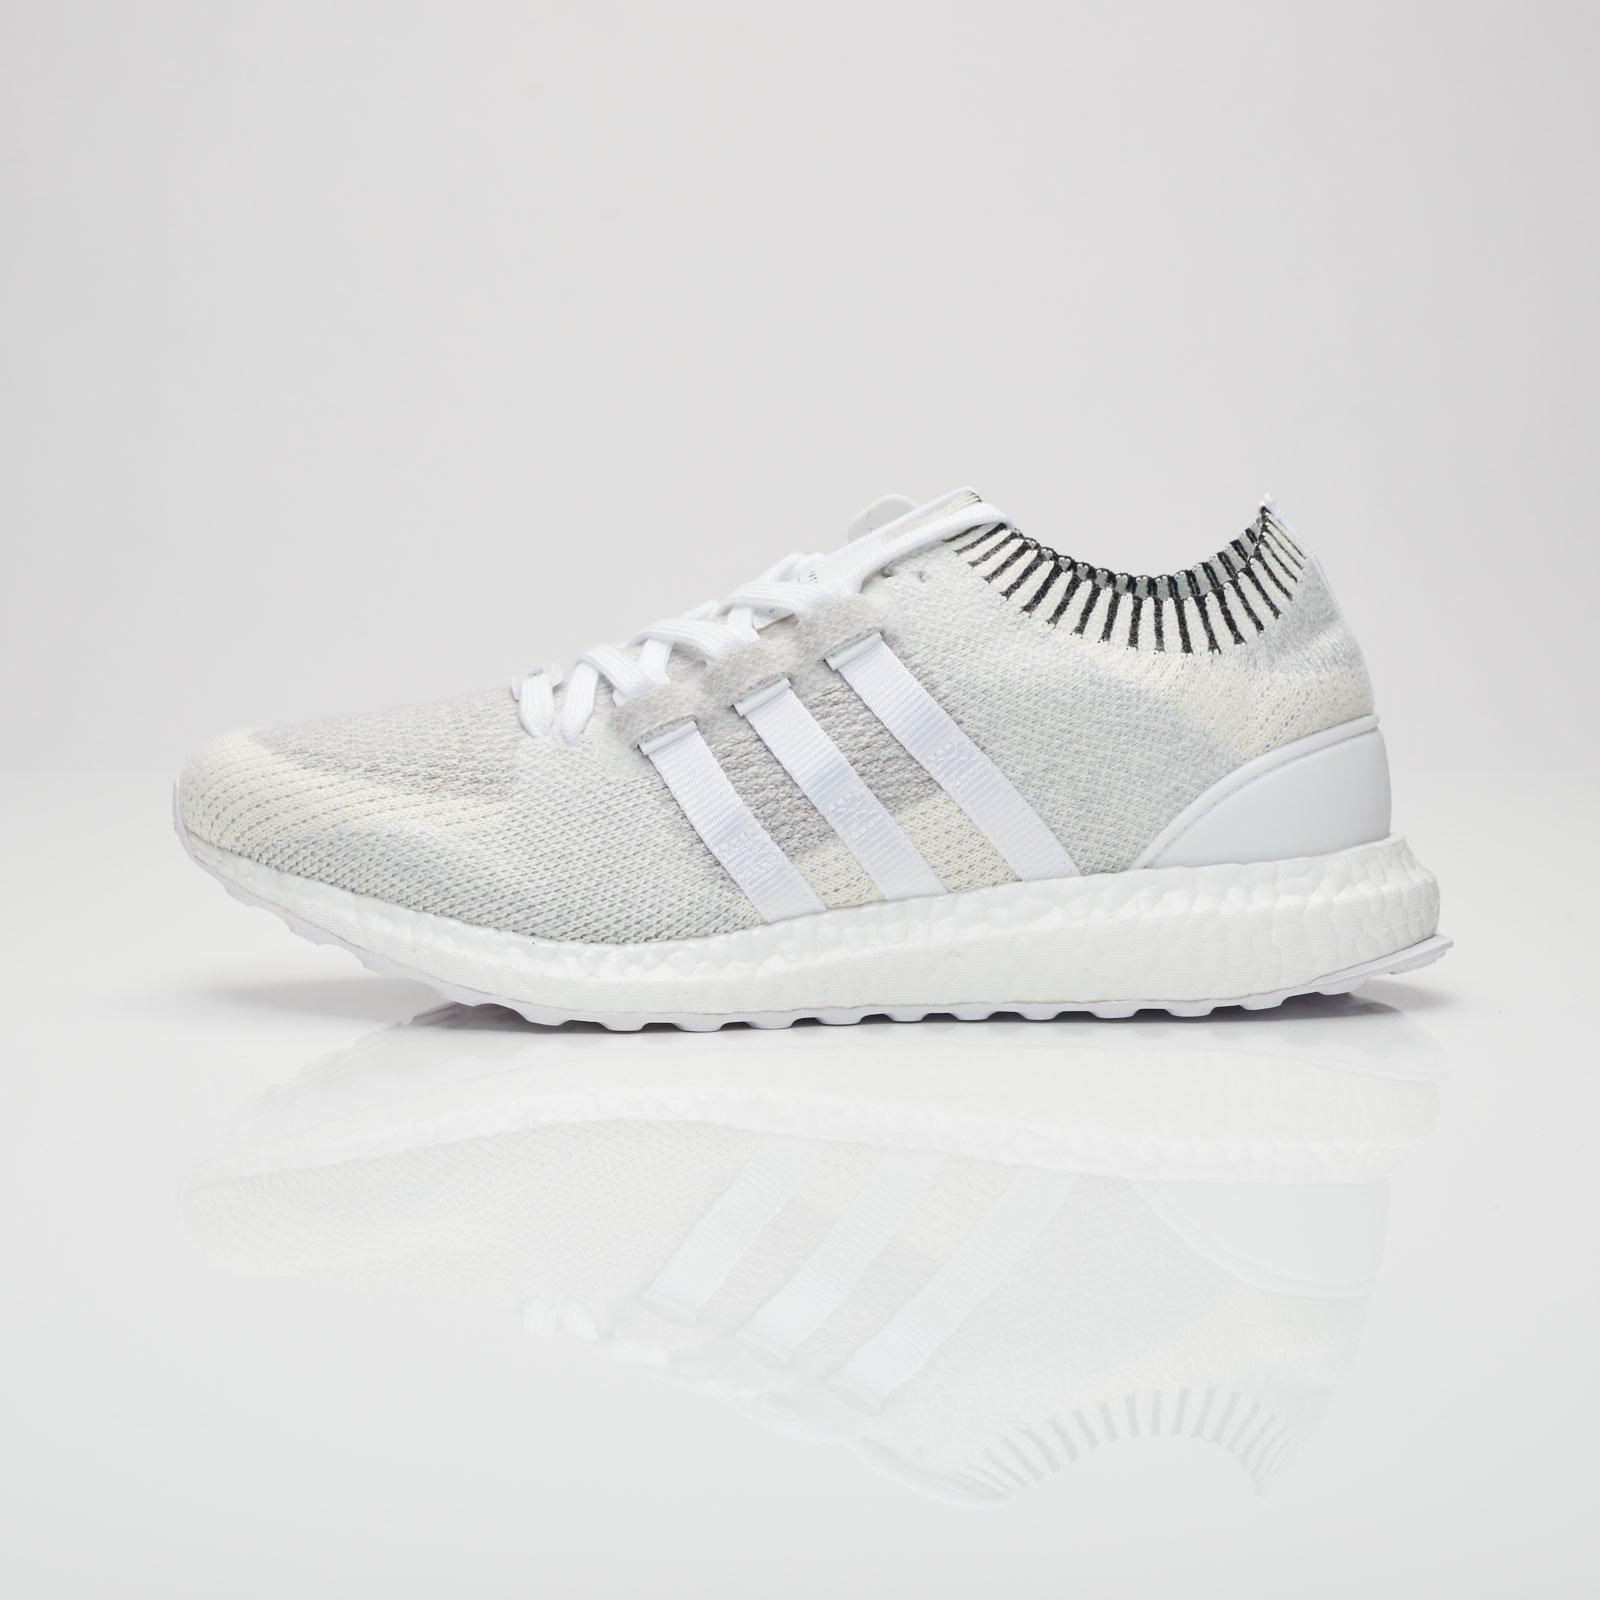 Adidas Originals Sommets Bas-support De Eqt Ultra P Et Chaussures De Sport p0Yfz5